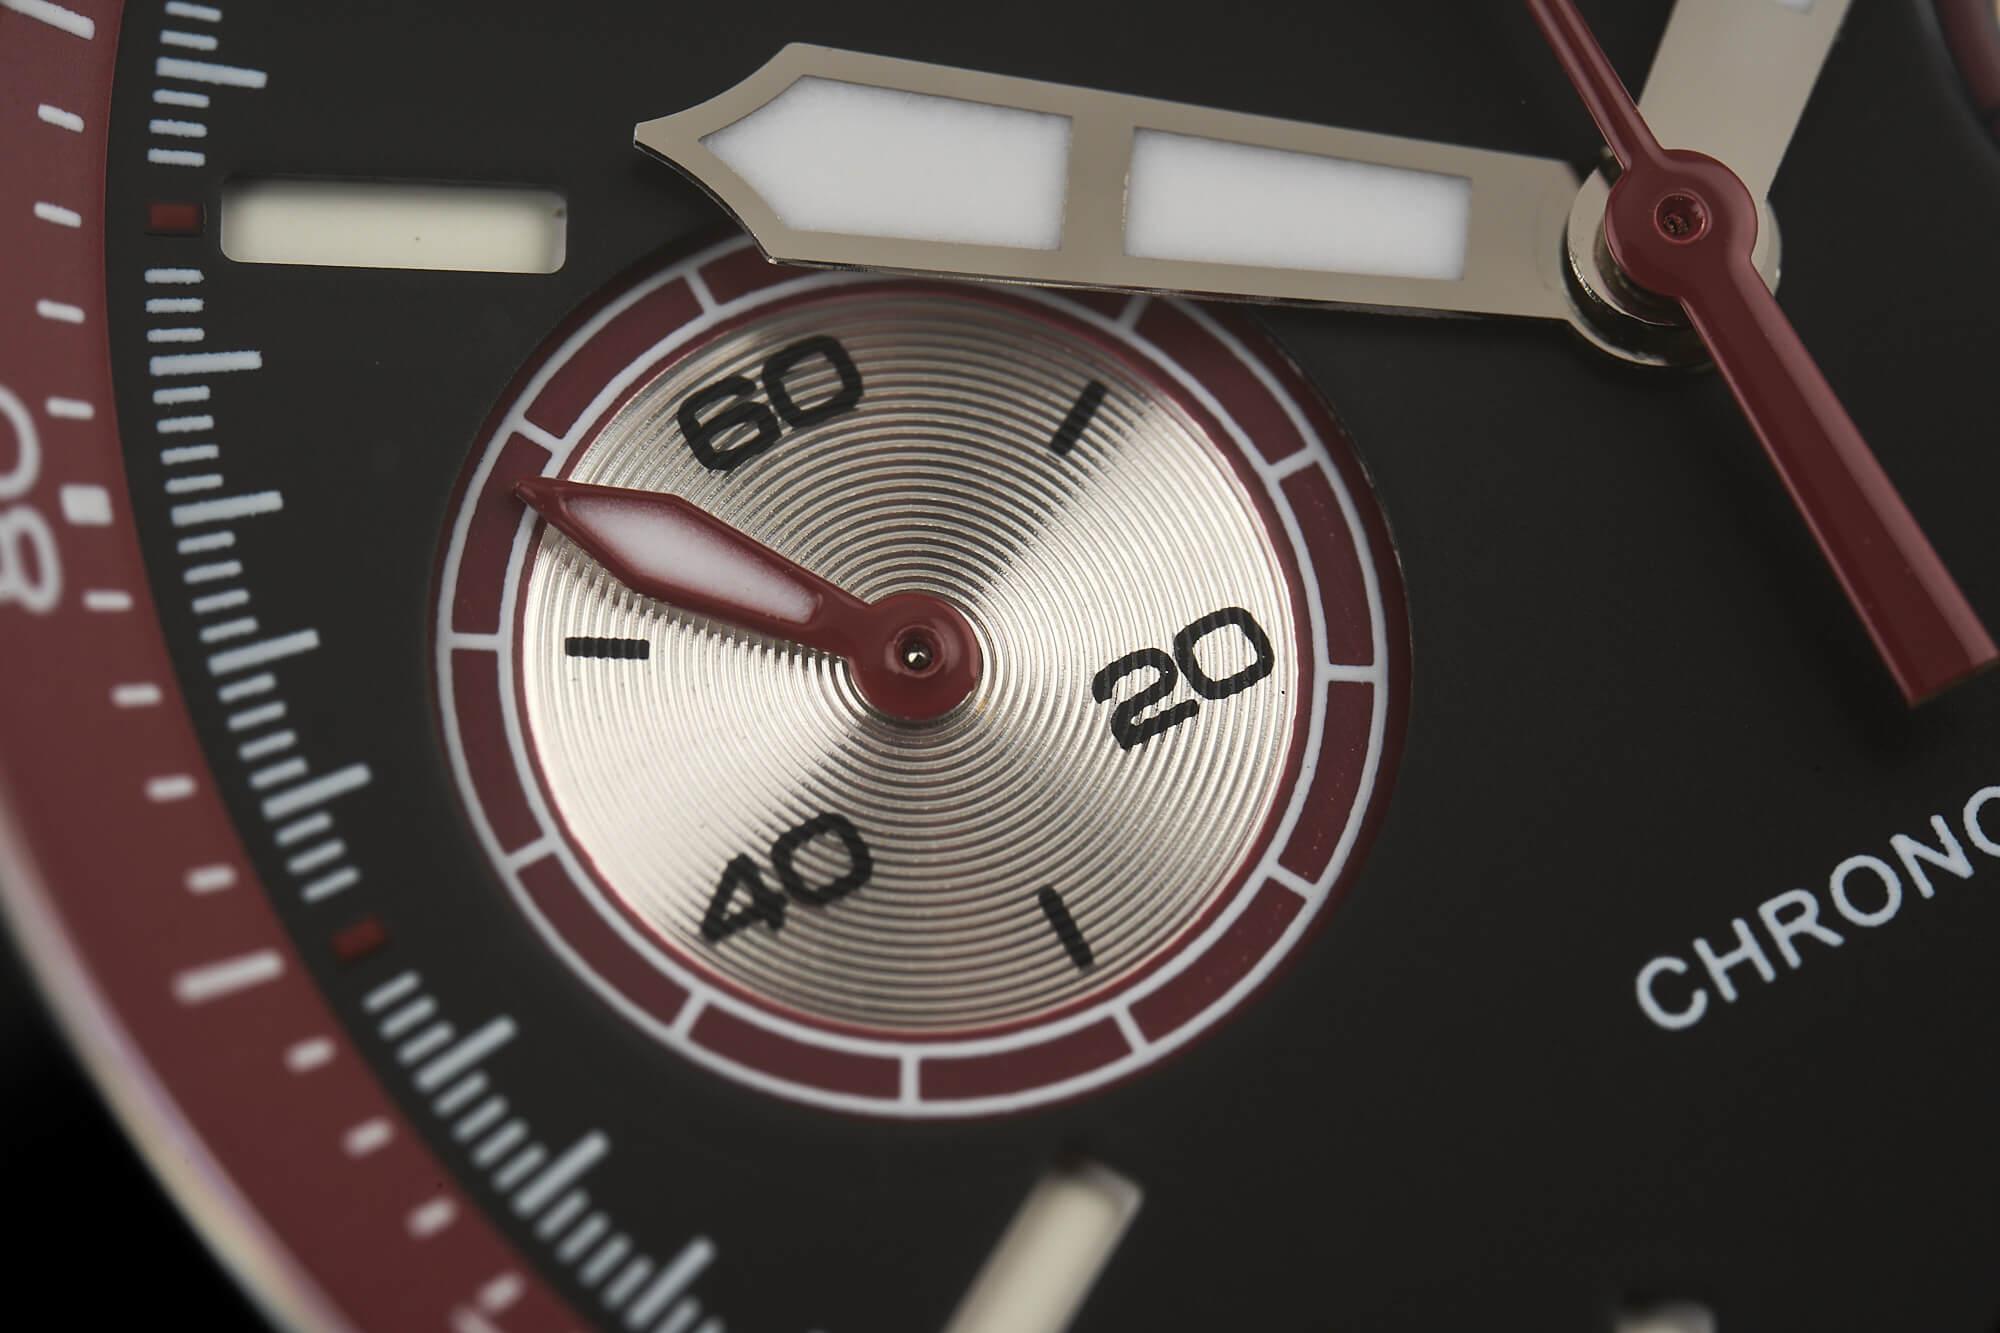 heitis-chronograph-v2-st19-4